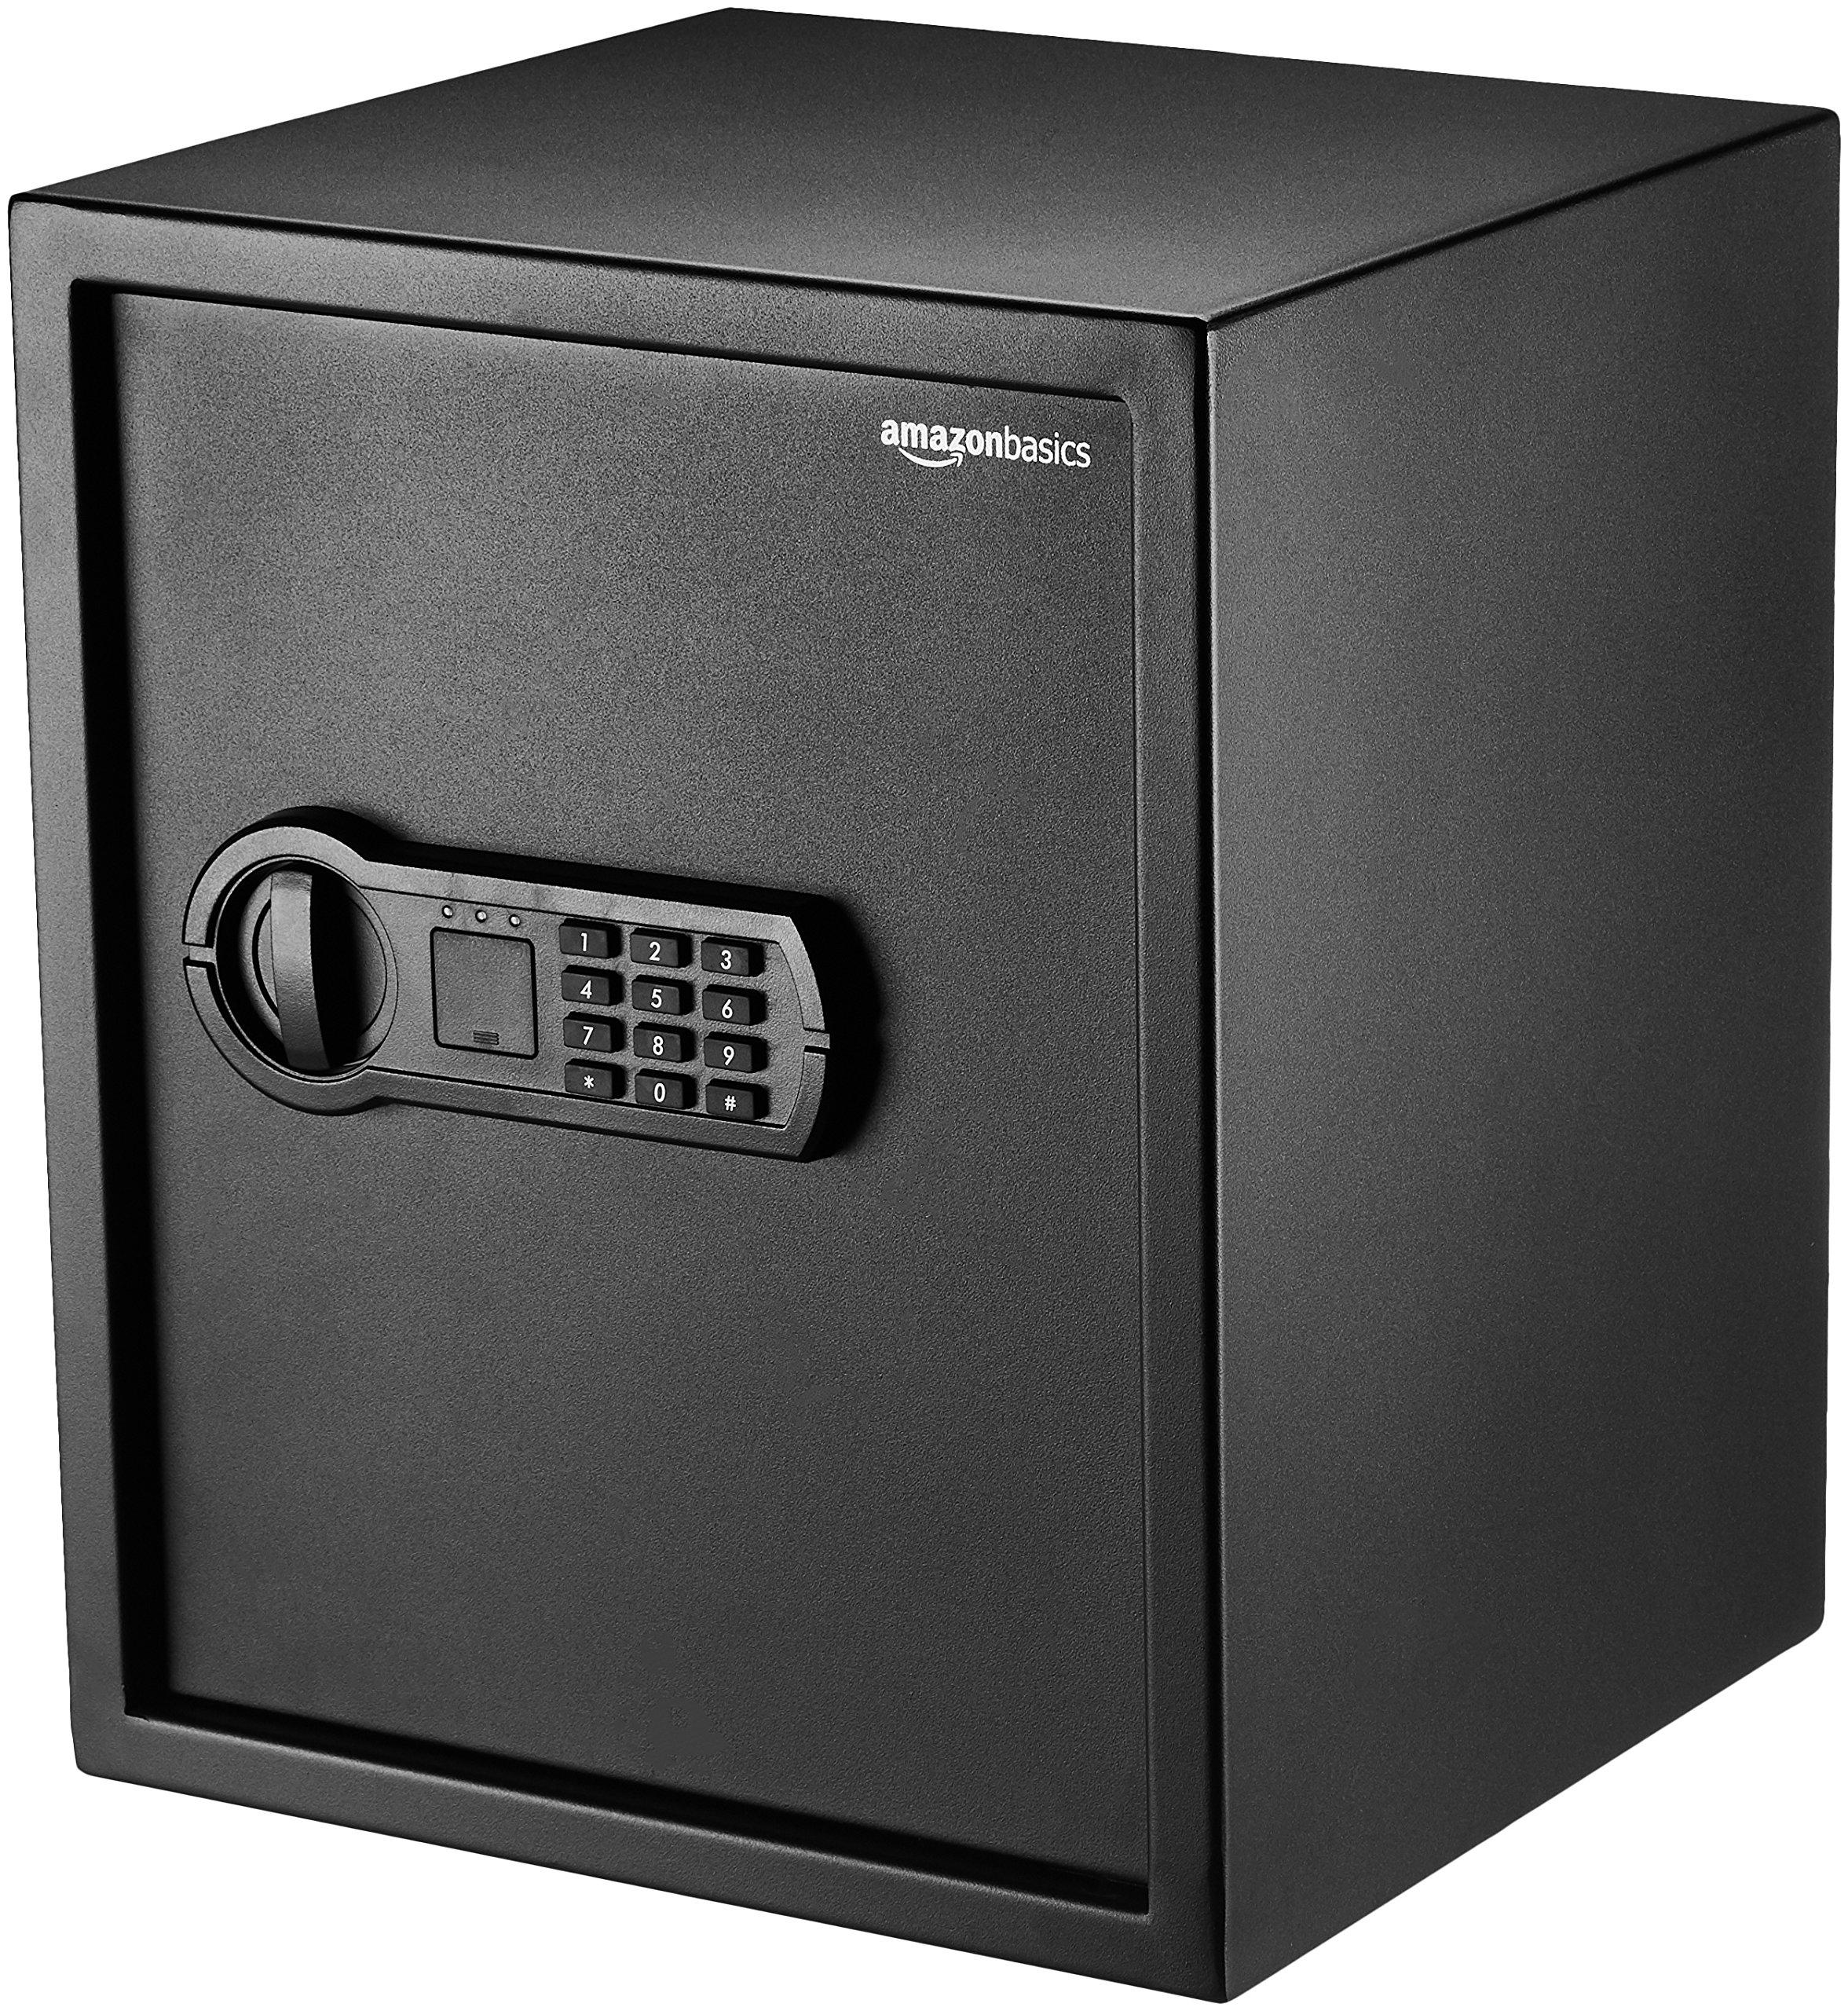 AmazonBasics Home Keypad Safe - 1.52 Cubic Feet, 13.8 x 13 x 16.5 Inches, Black by AmazonBasics